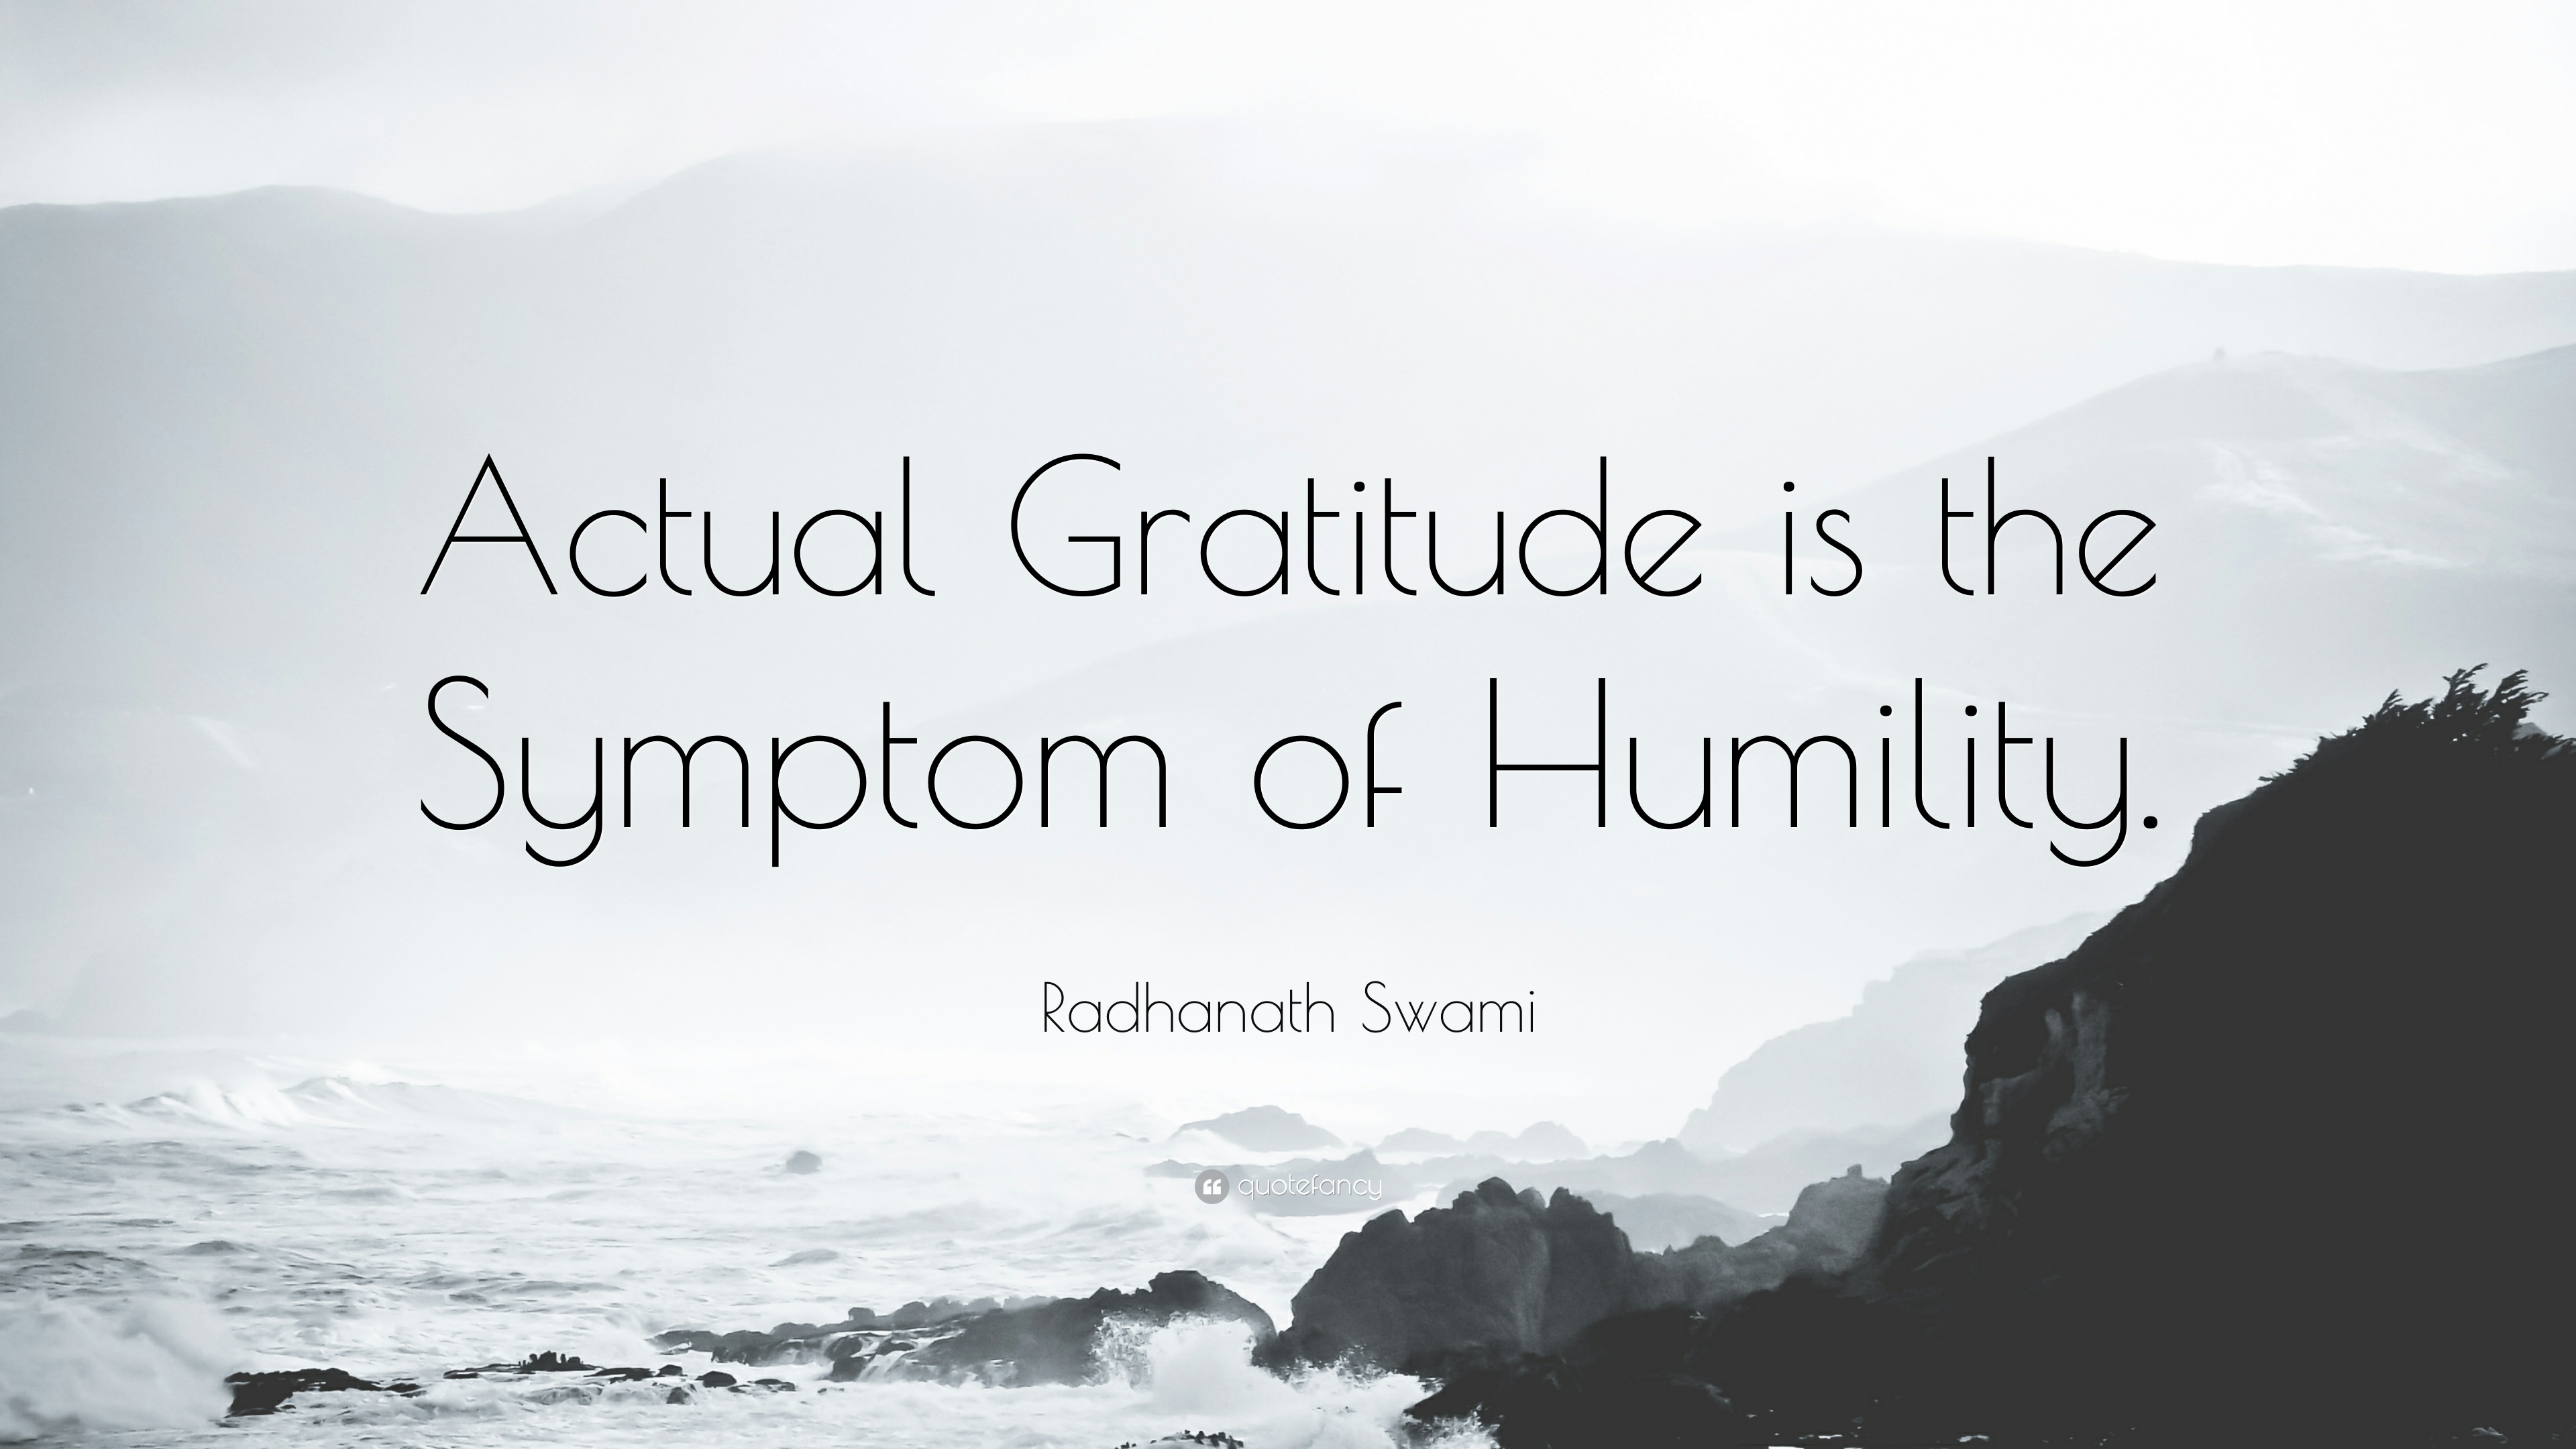 Gratitude Quotes: U201cActual Gratitude Is The Symptom Of Humility.u201d U2014  Radhanath Swami